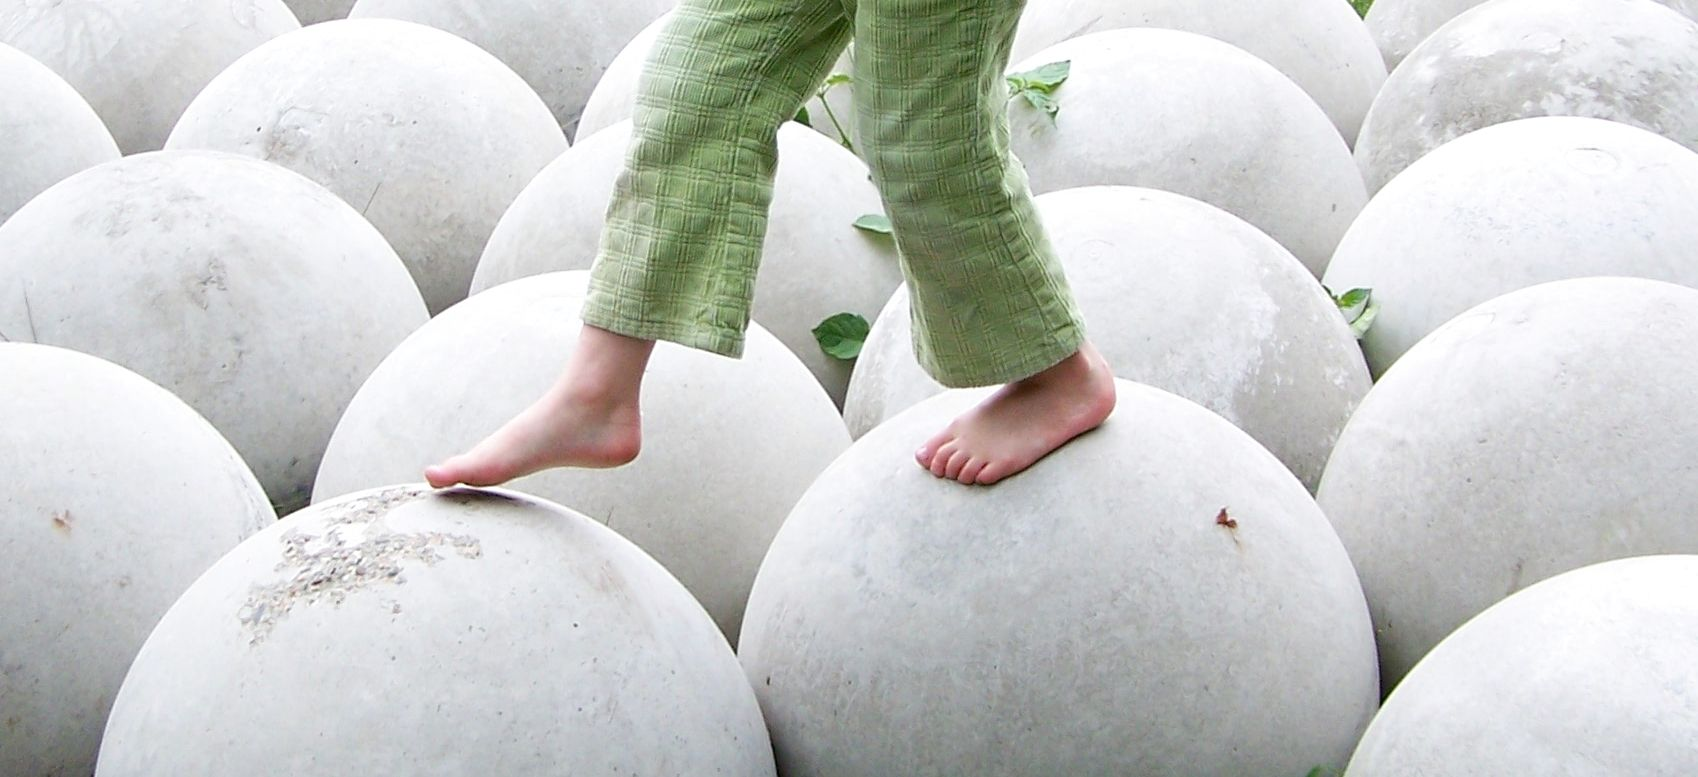 Finding the correct balance